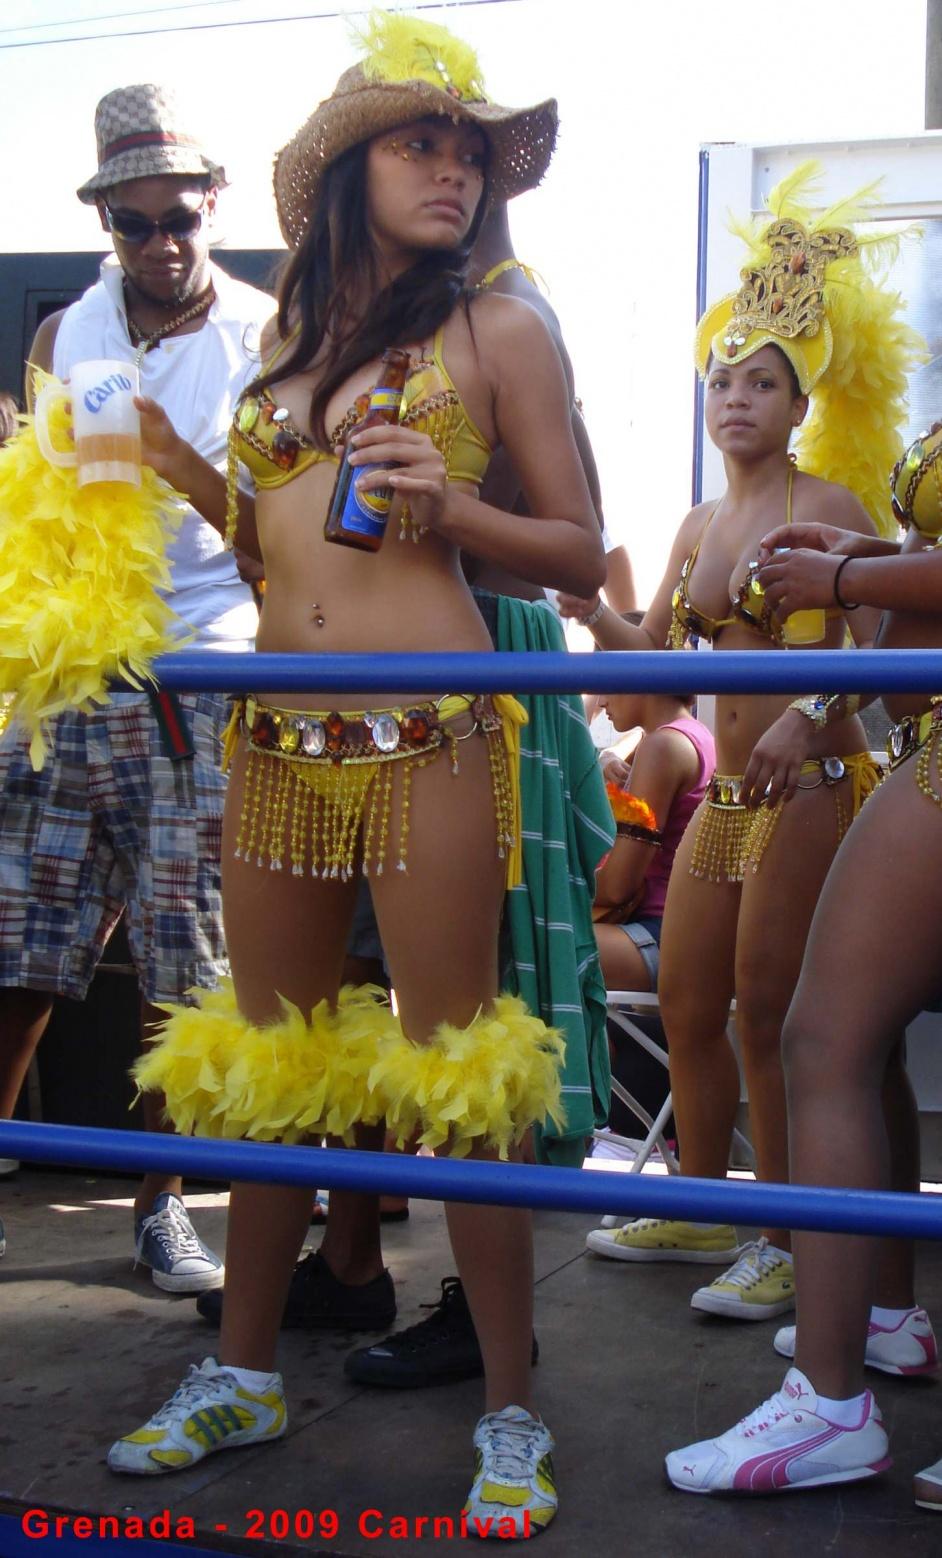 Click image for larger version  Name:Grenada2009Carnival Trim.jpg Views:109 Size:417.0 KB ID:20146